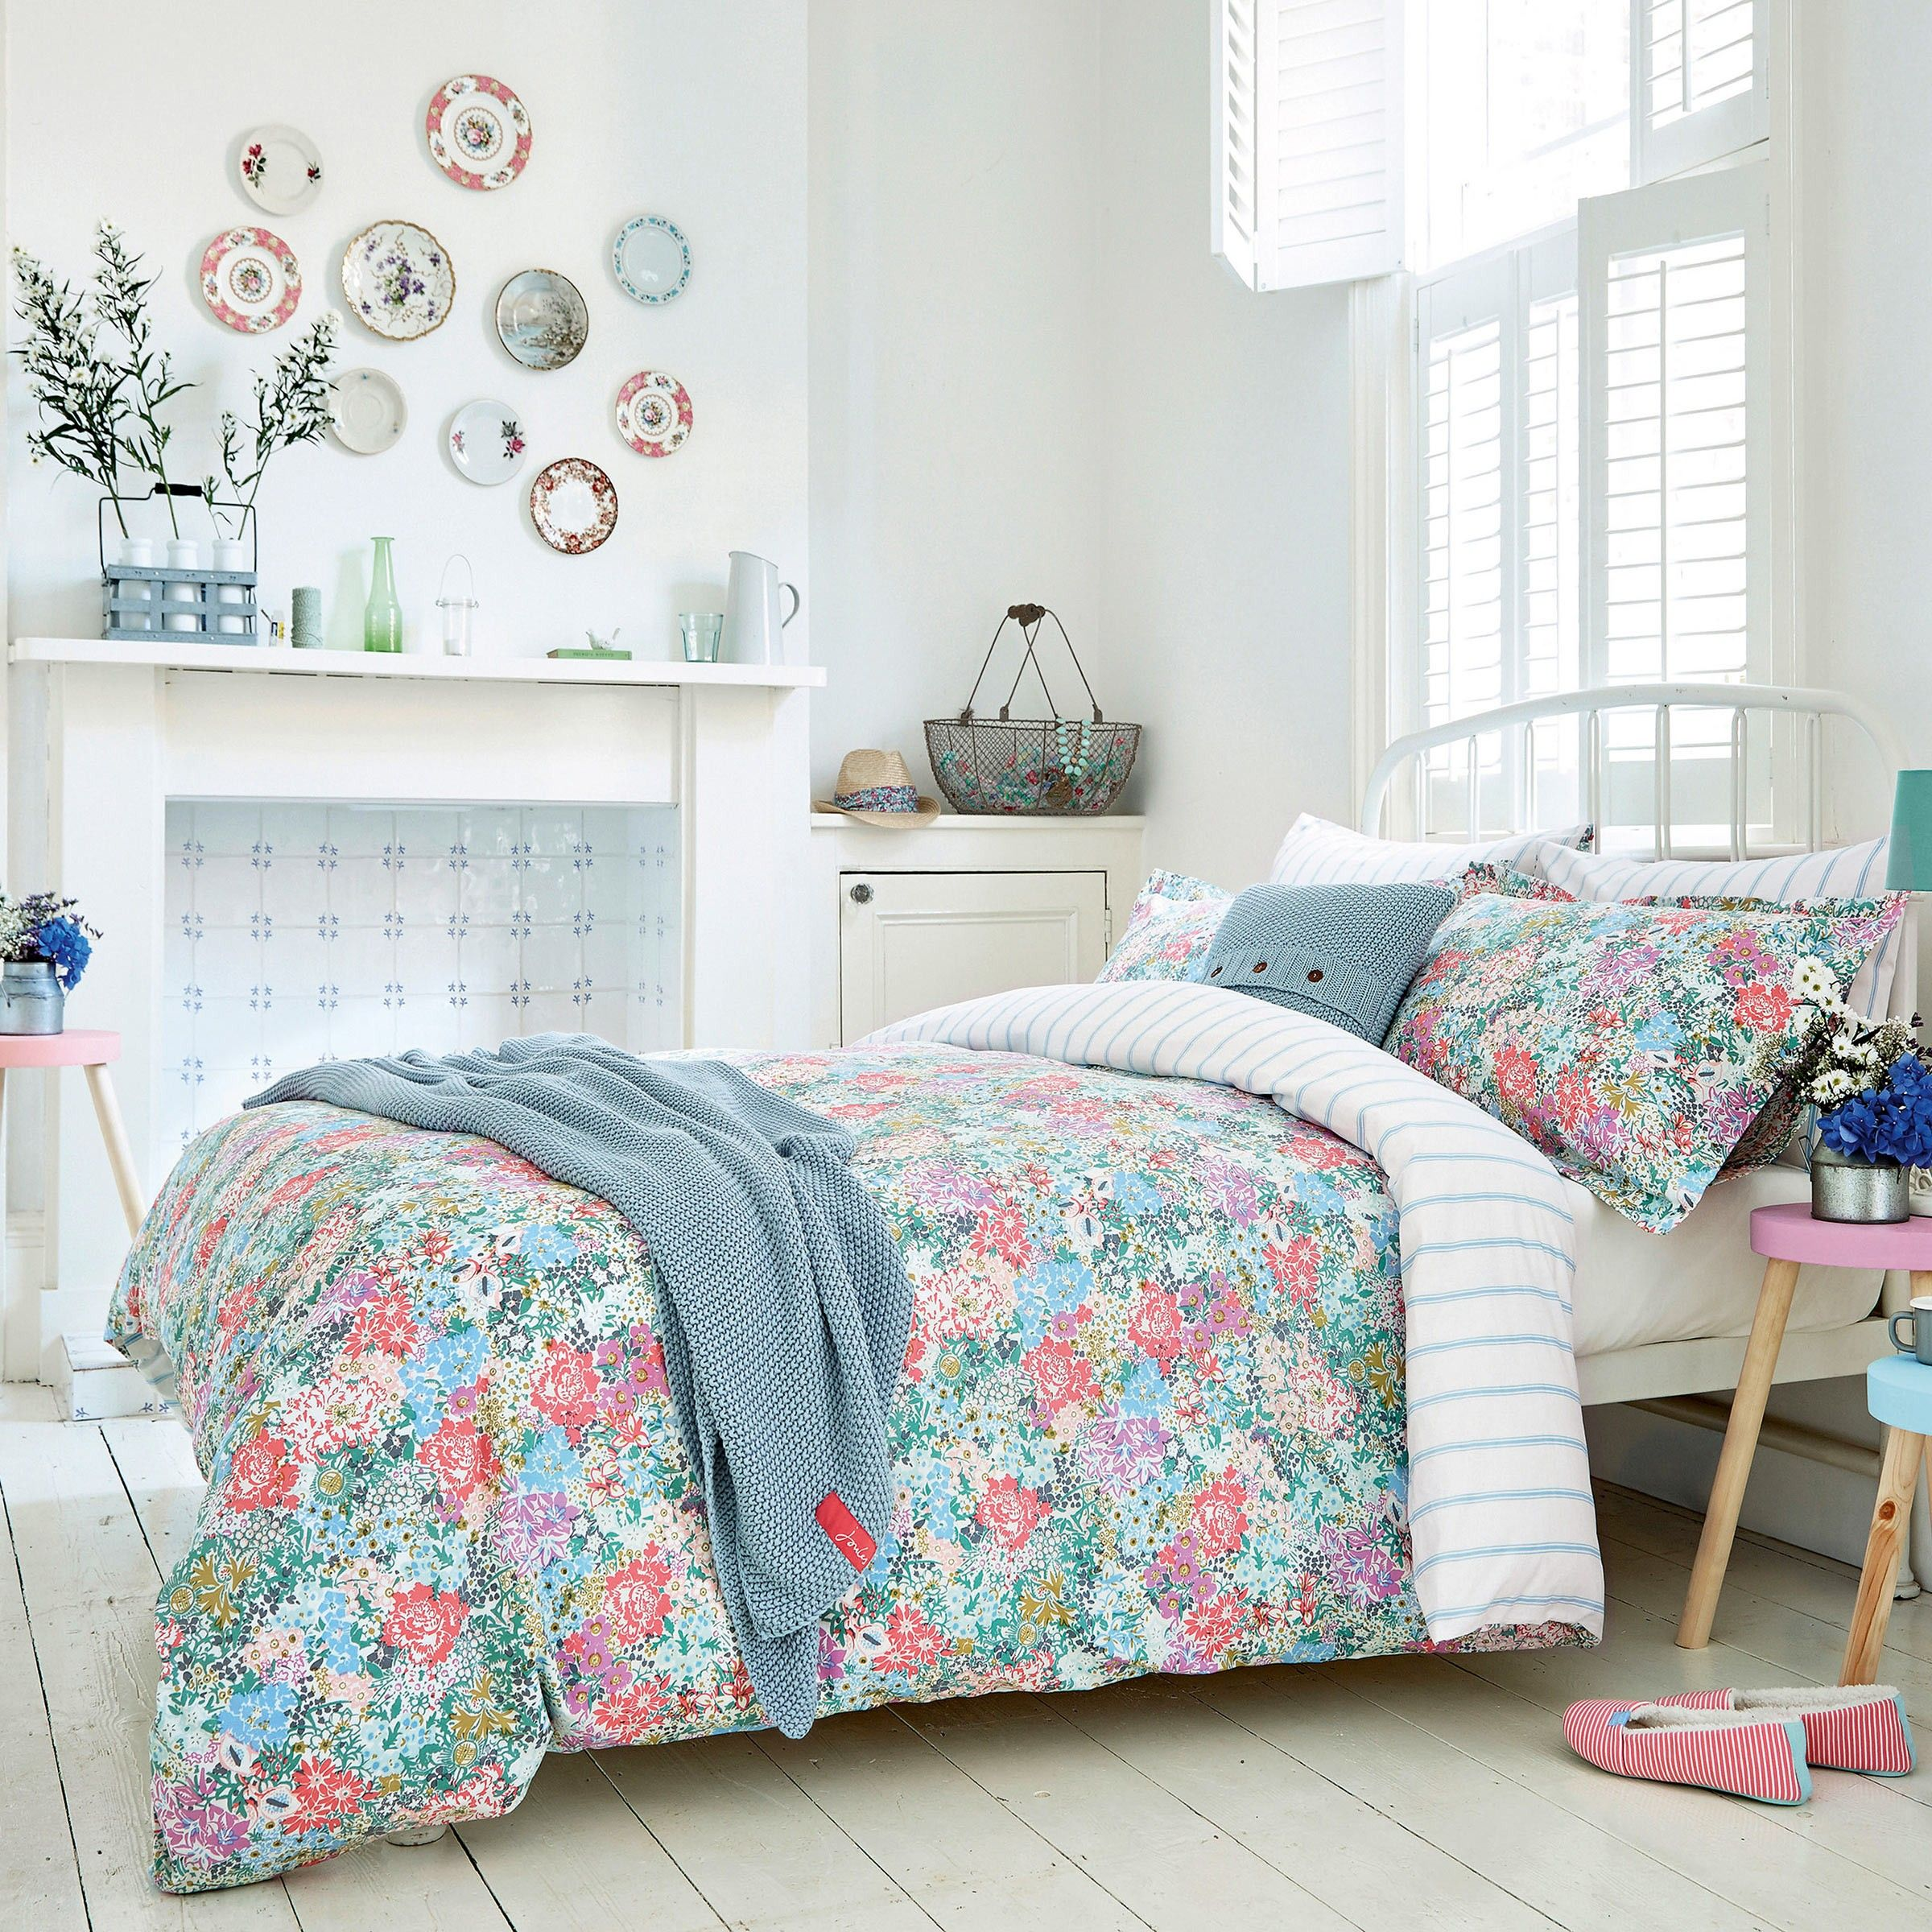 s sheet vintage rulla nursery twin bedding bed animals children marimekko pin flat